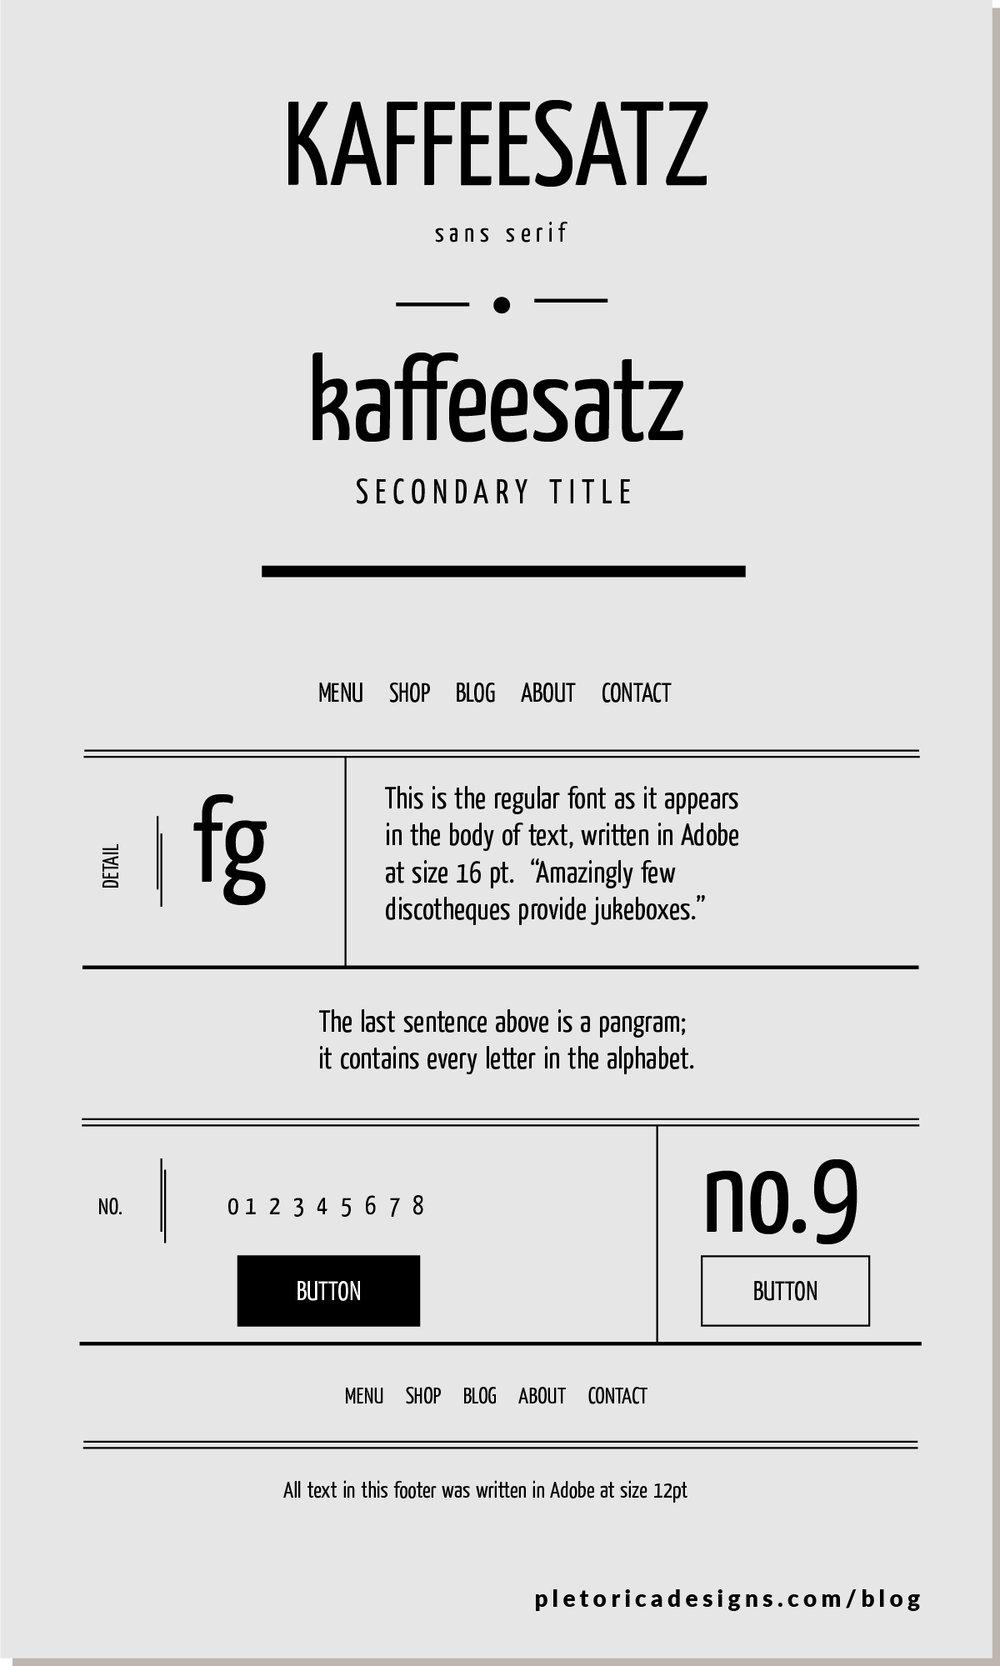 LET'S TYPE: Kaffeesatz — PLETÓRICA DESIGNS